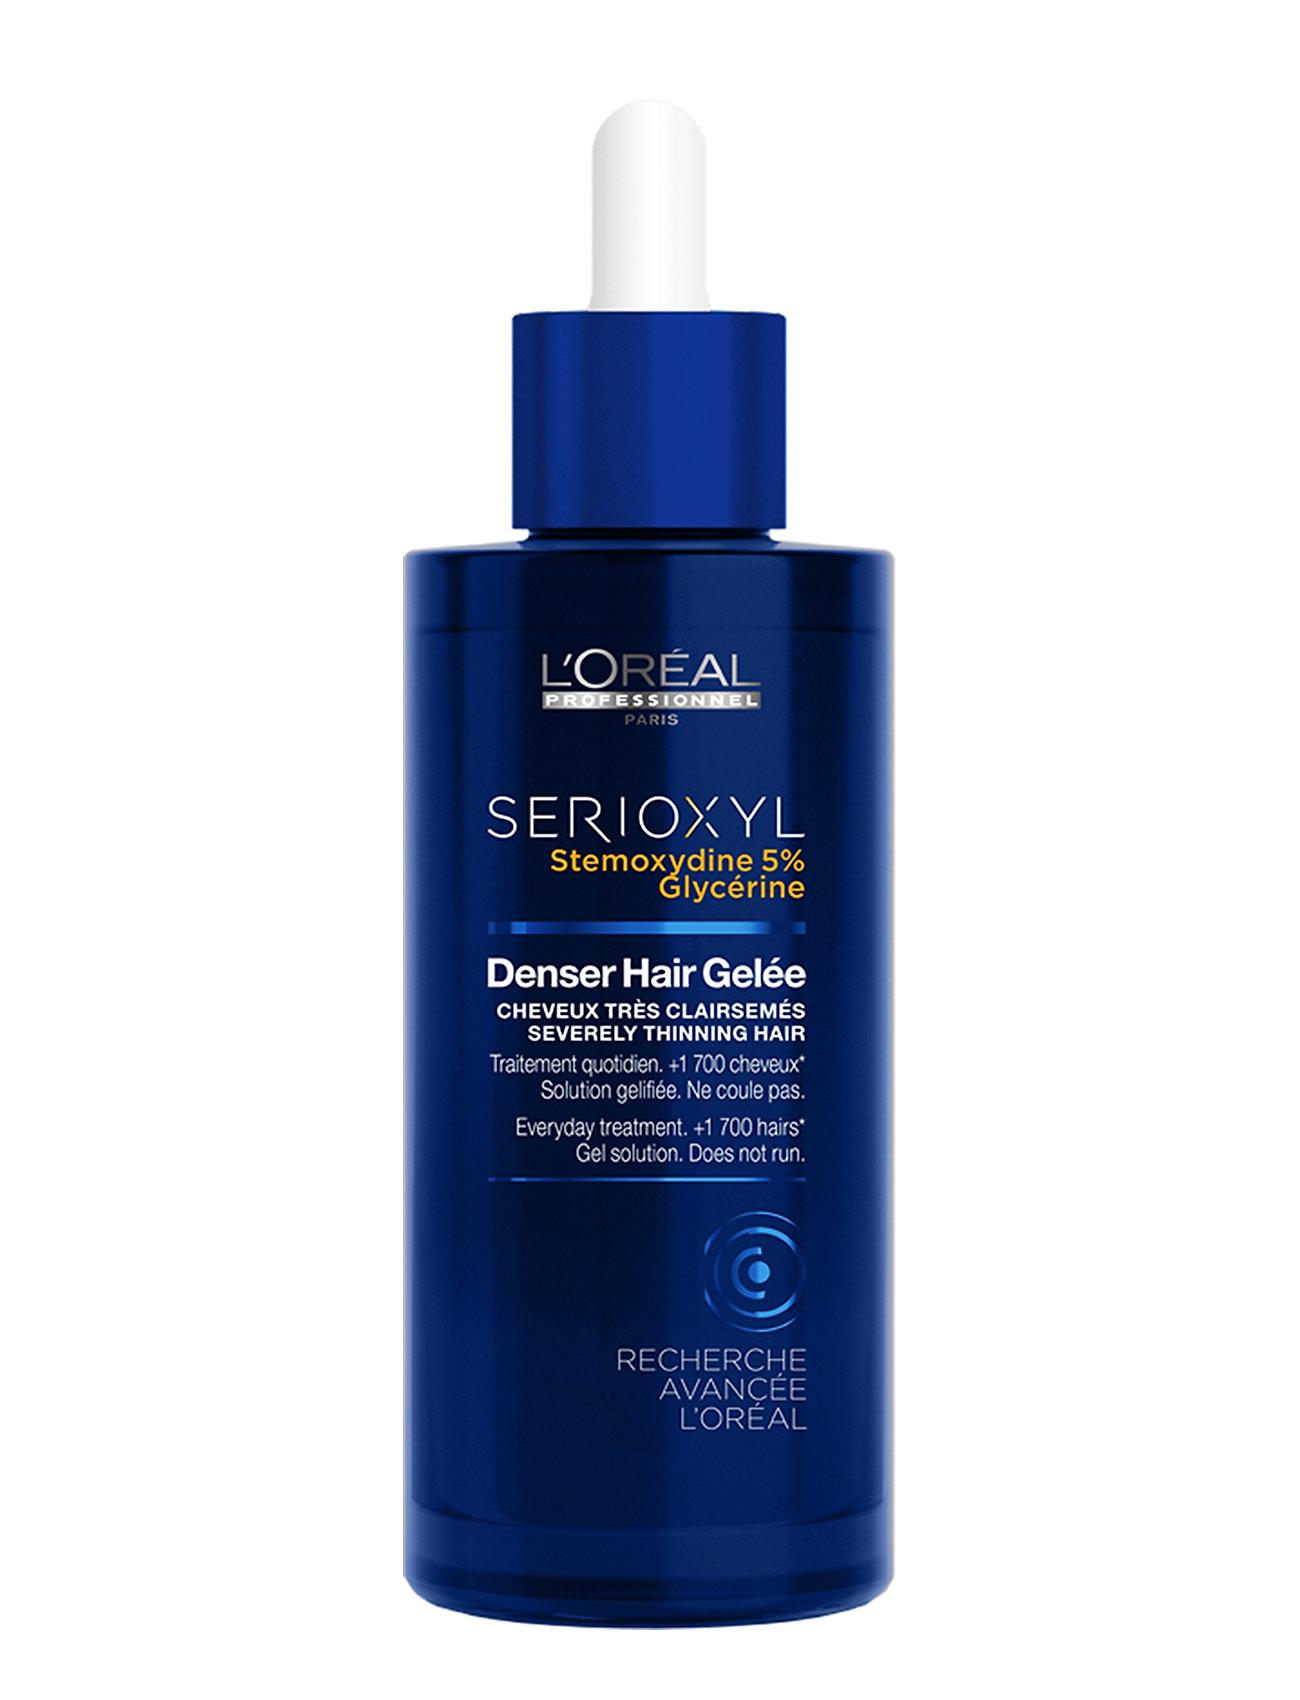 L'OréAl Professionnel Serioxyl Gel Denser Gelè Serum - L'Oréal Professionnel